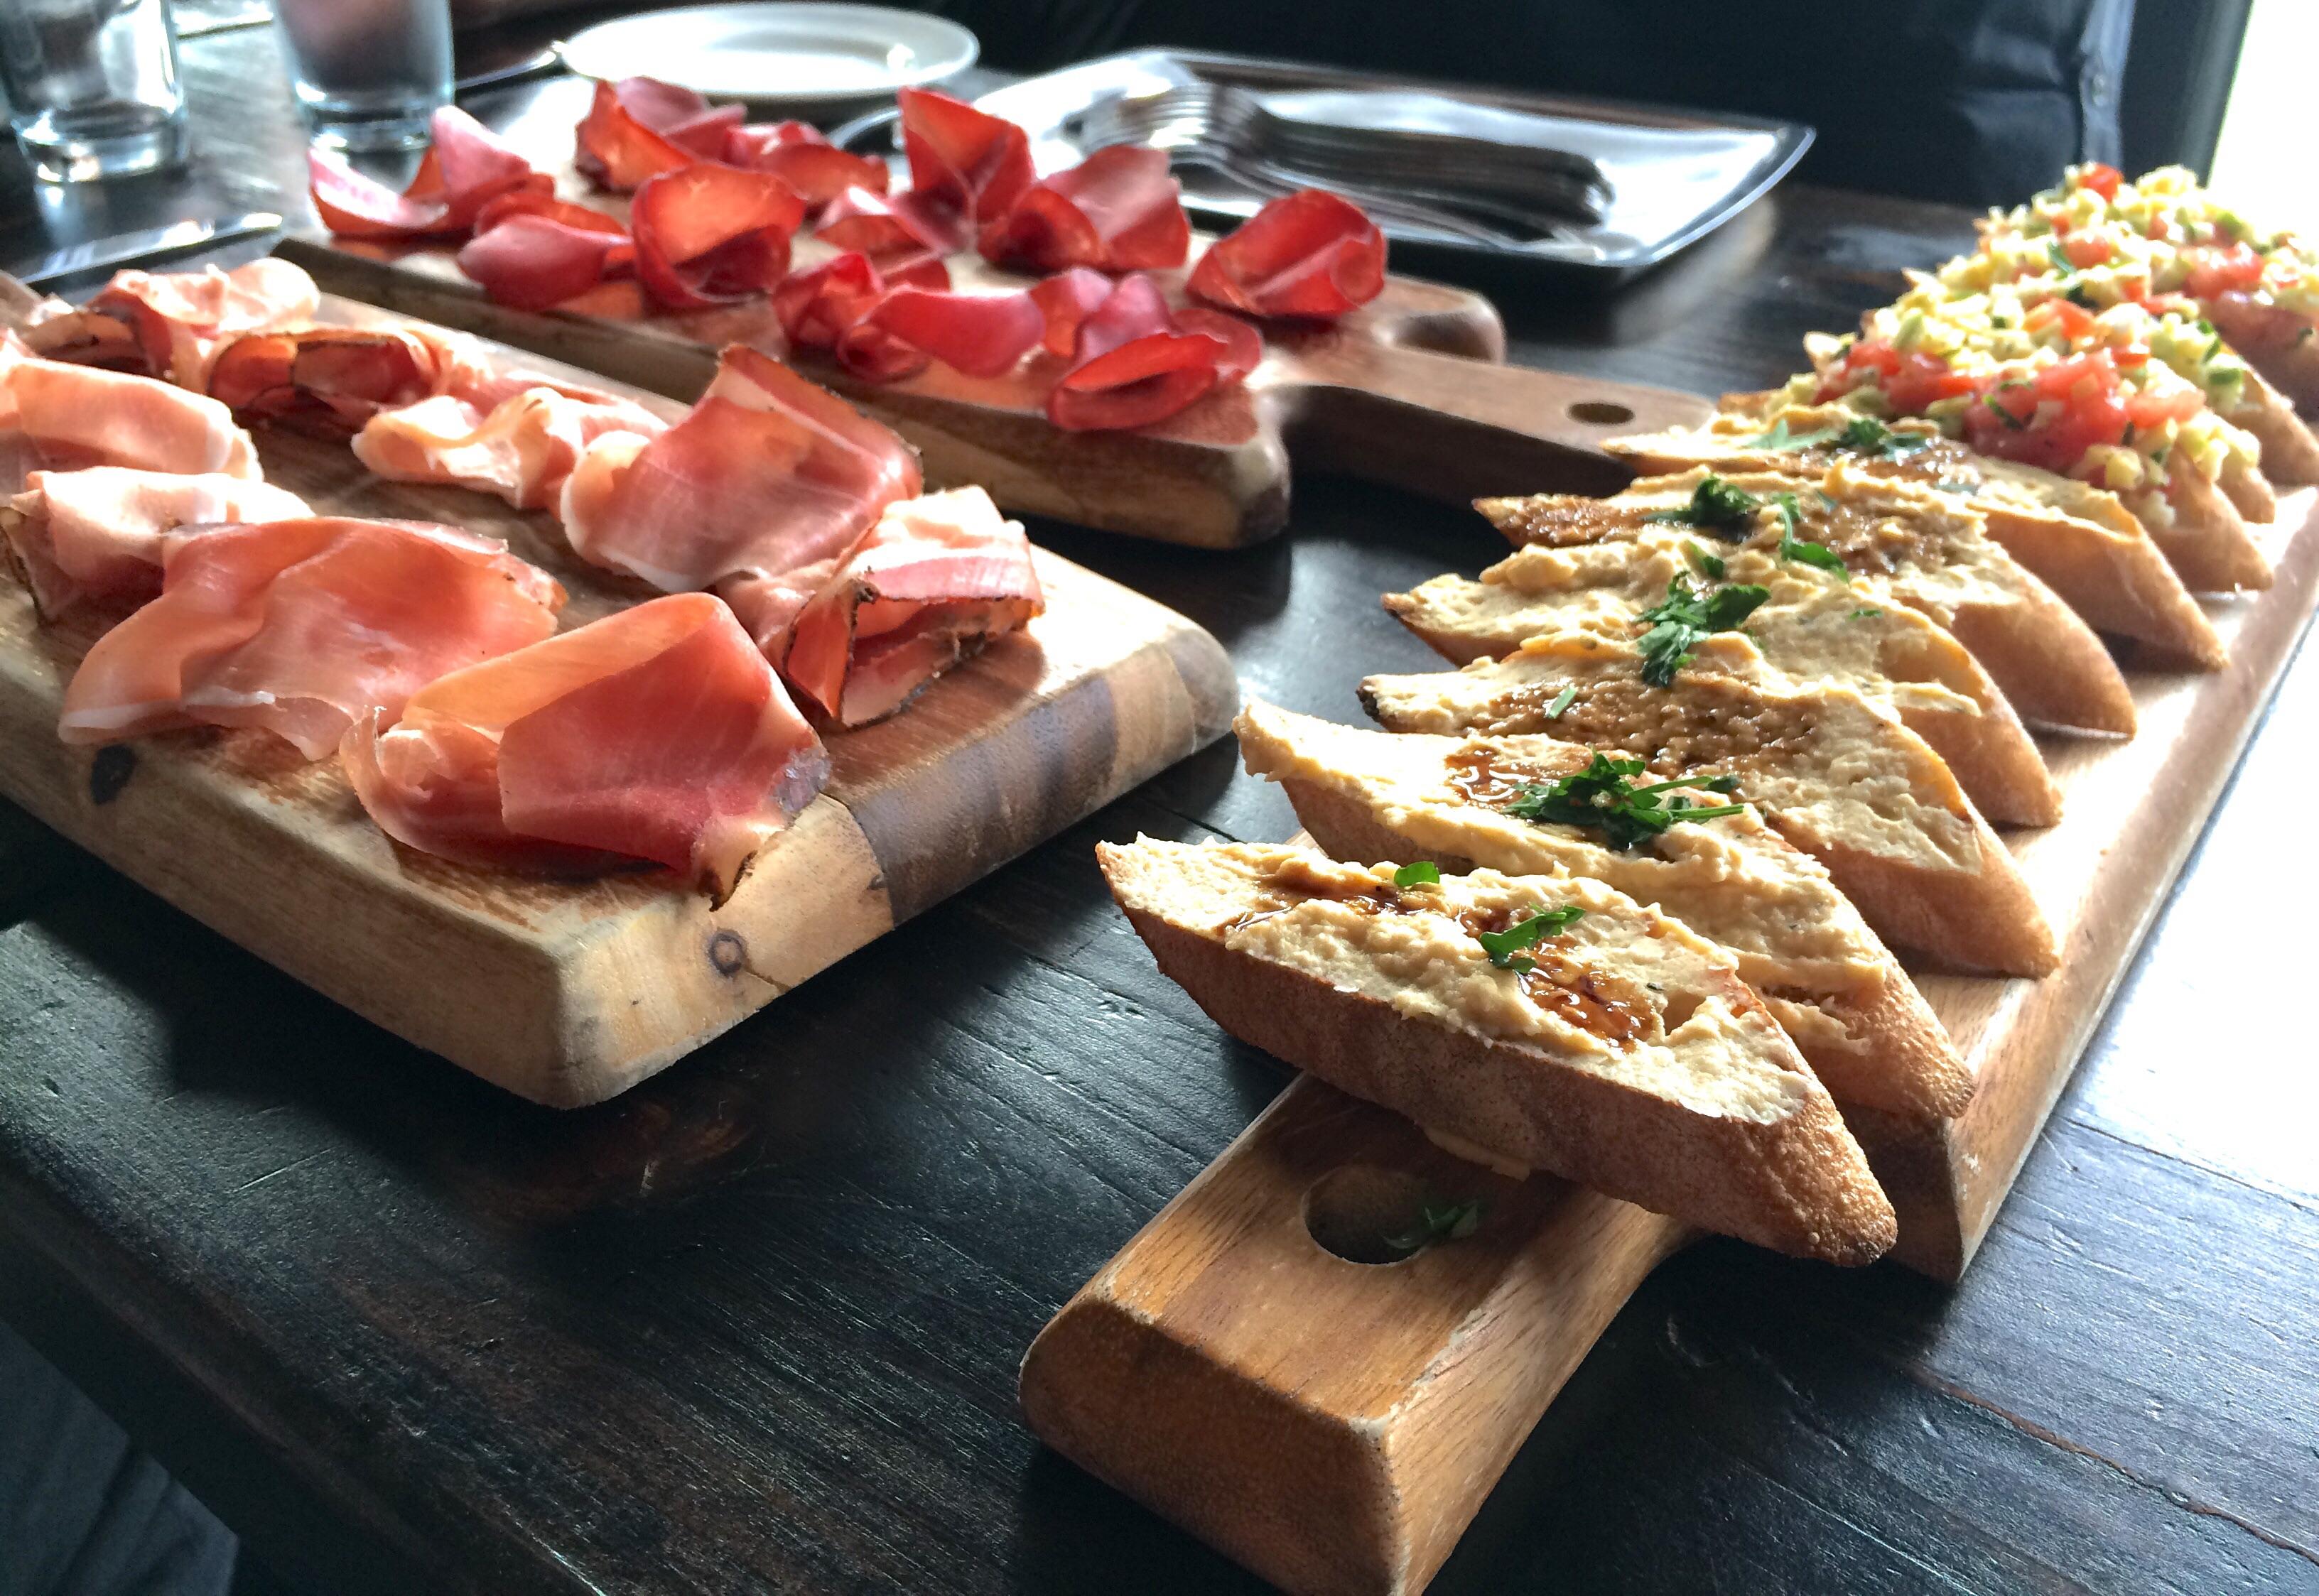 Mario Batali Food Tour Walks Of New York